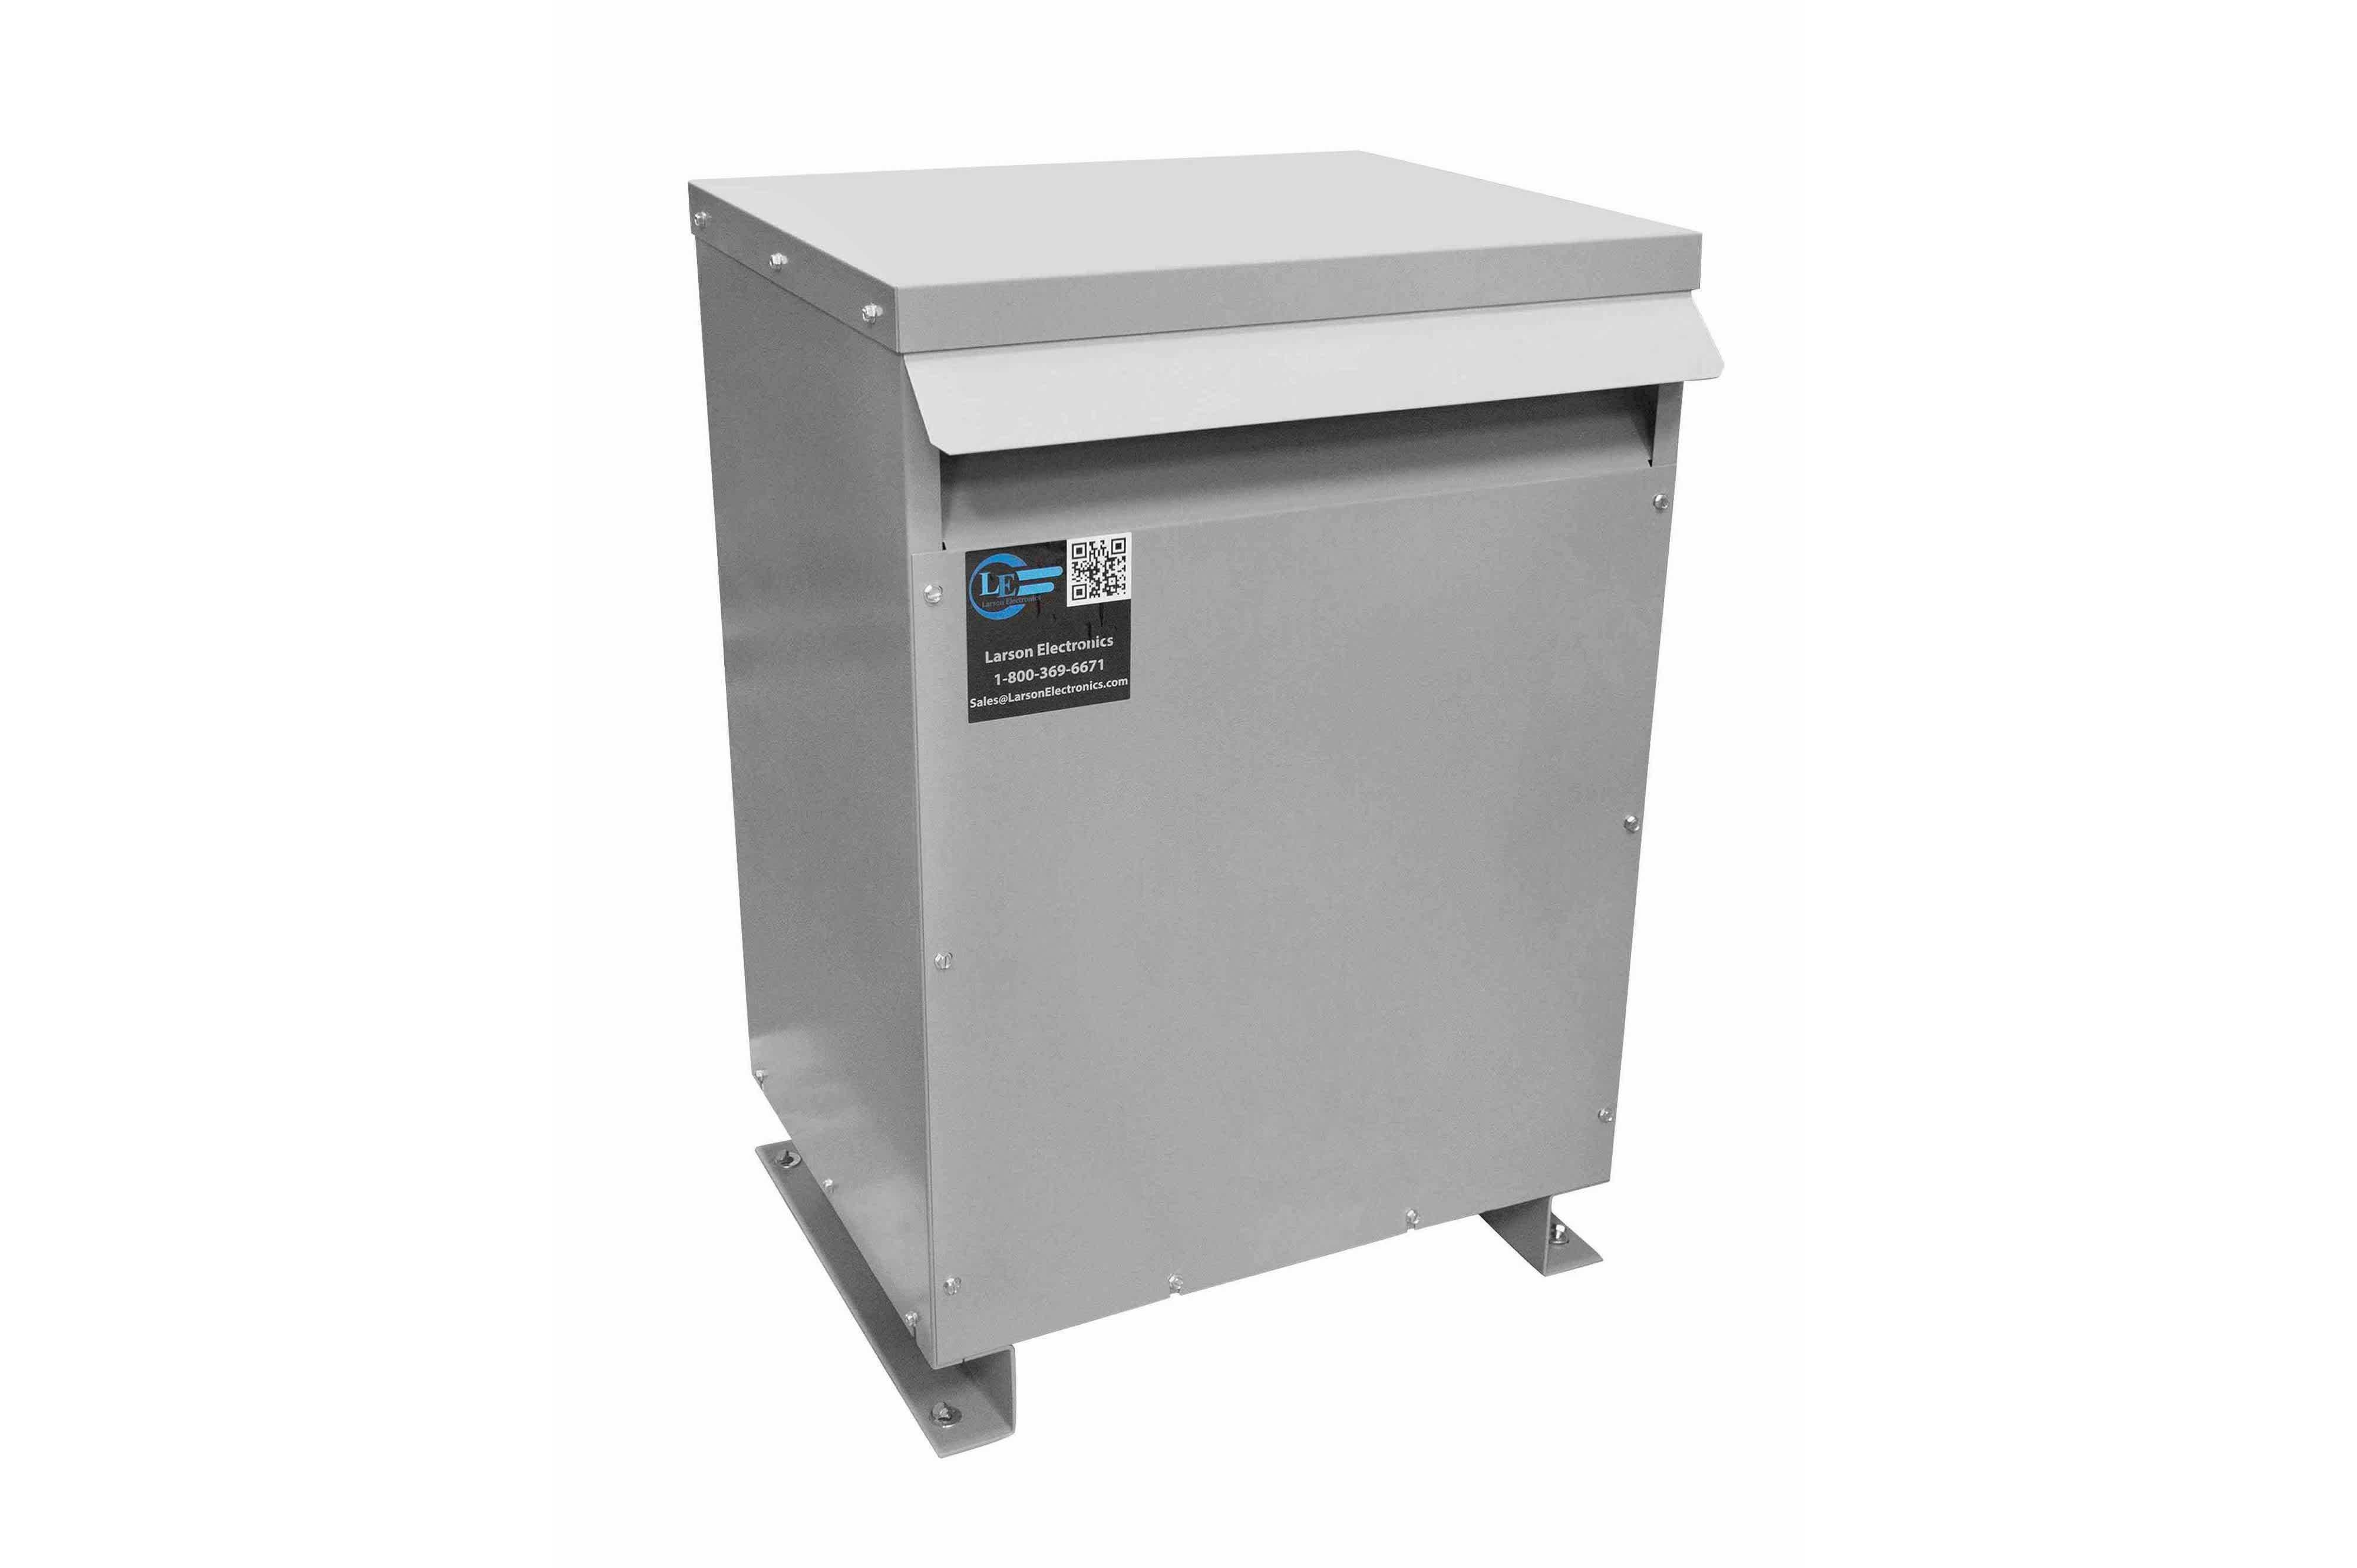 27 kVA 3PH Isolation Transformer, 575V Wye Primary, 400V Delta Secondary, N3R, Ventilated, 60 Hz